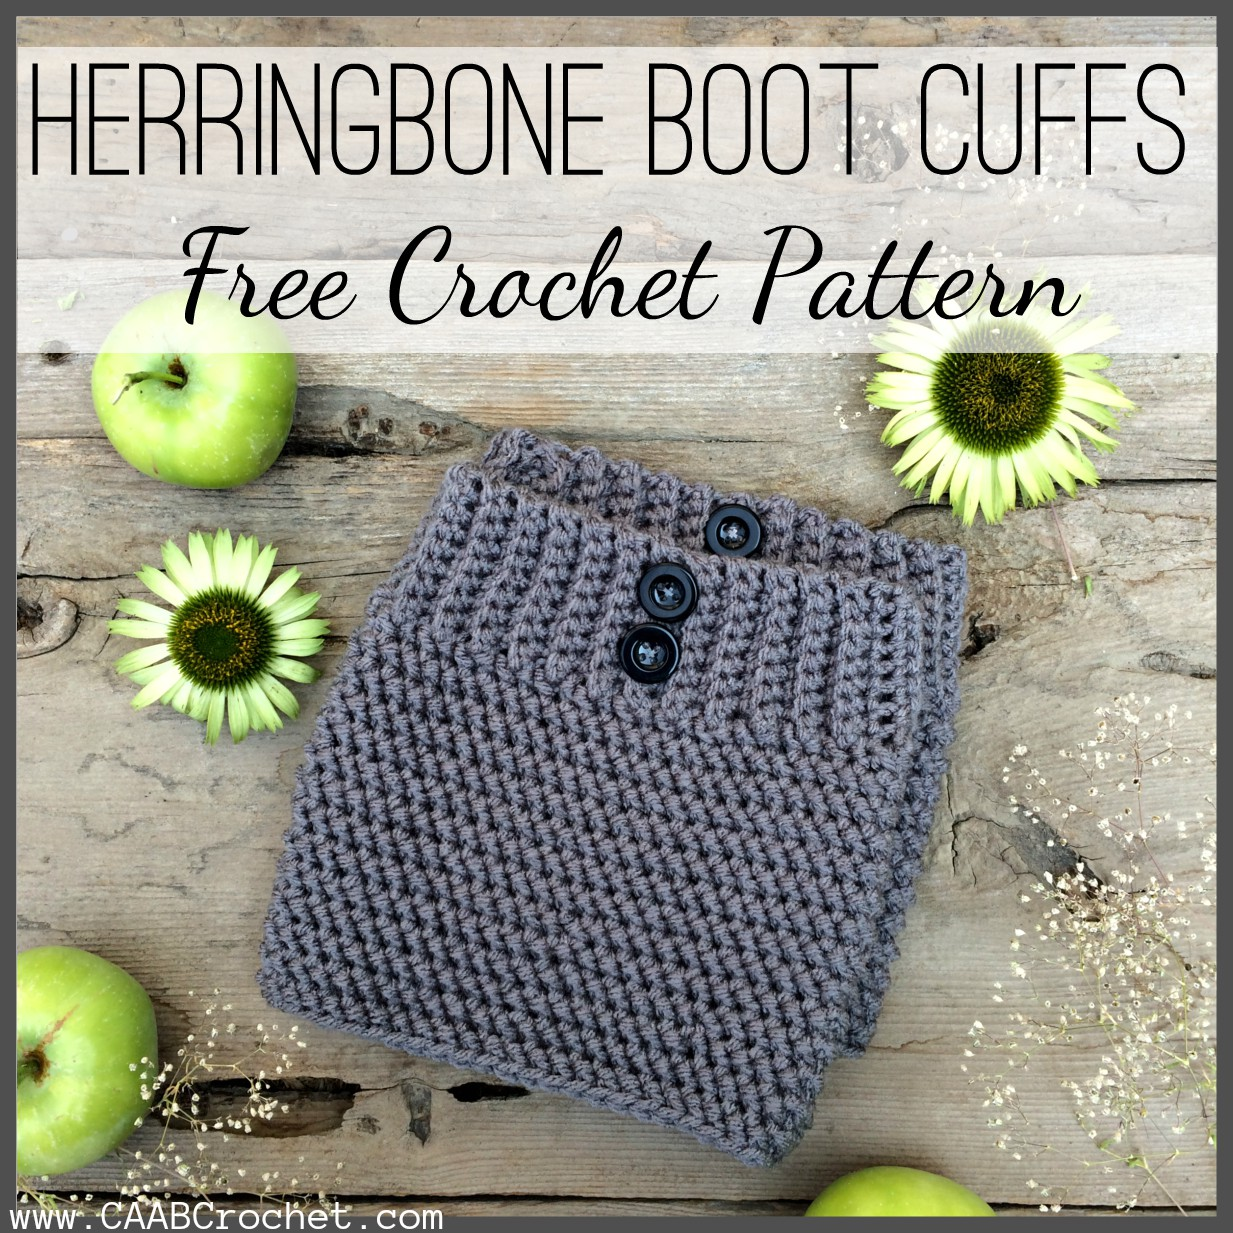 Crochet boot cuff pattern herringbone boot cuff free crochet pattern dt1010fo